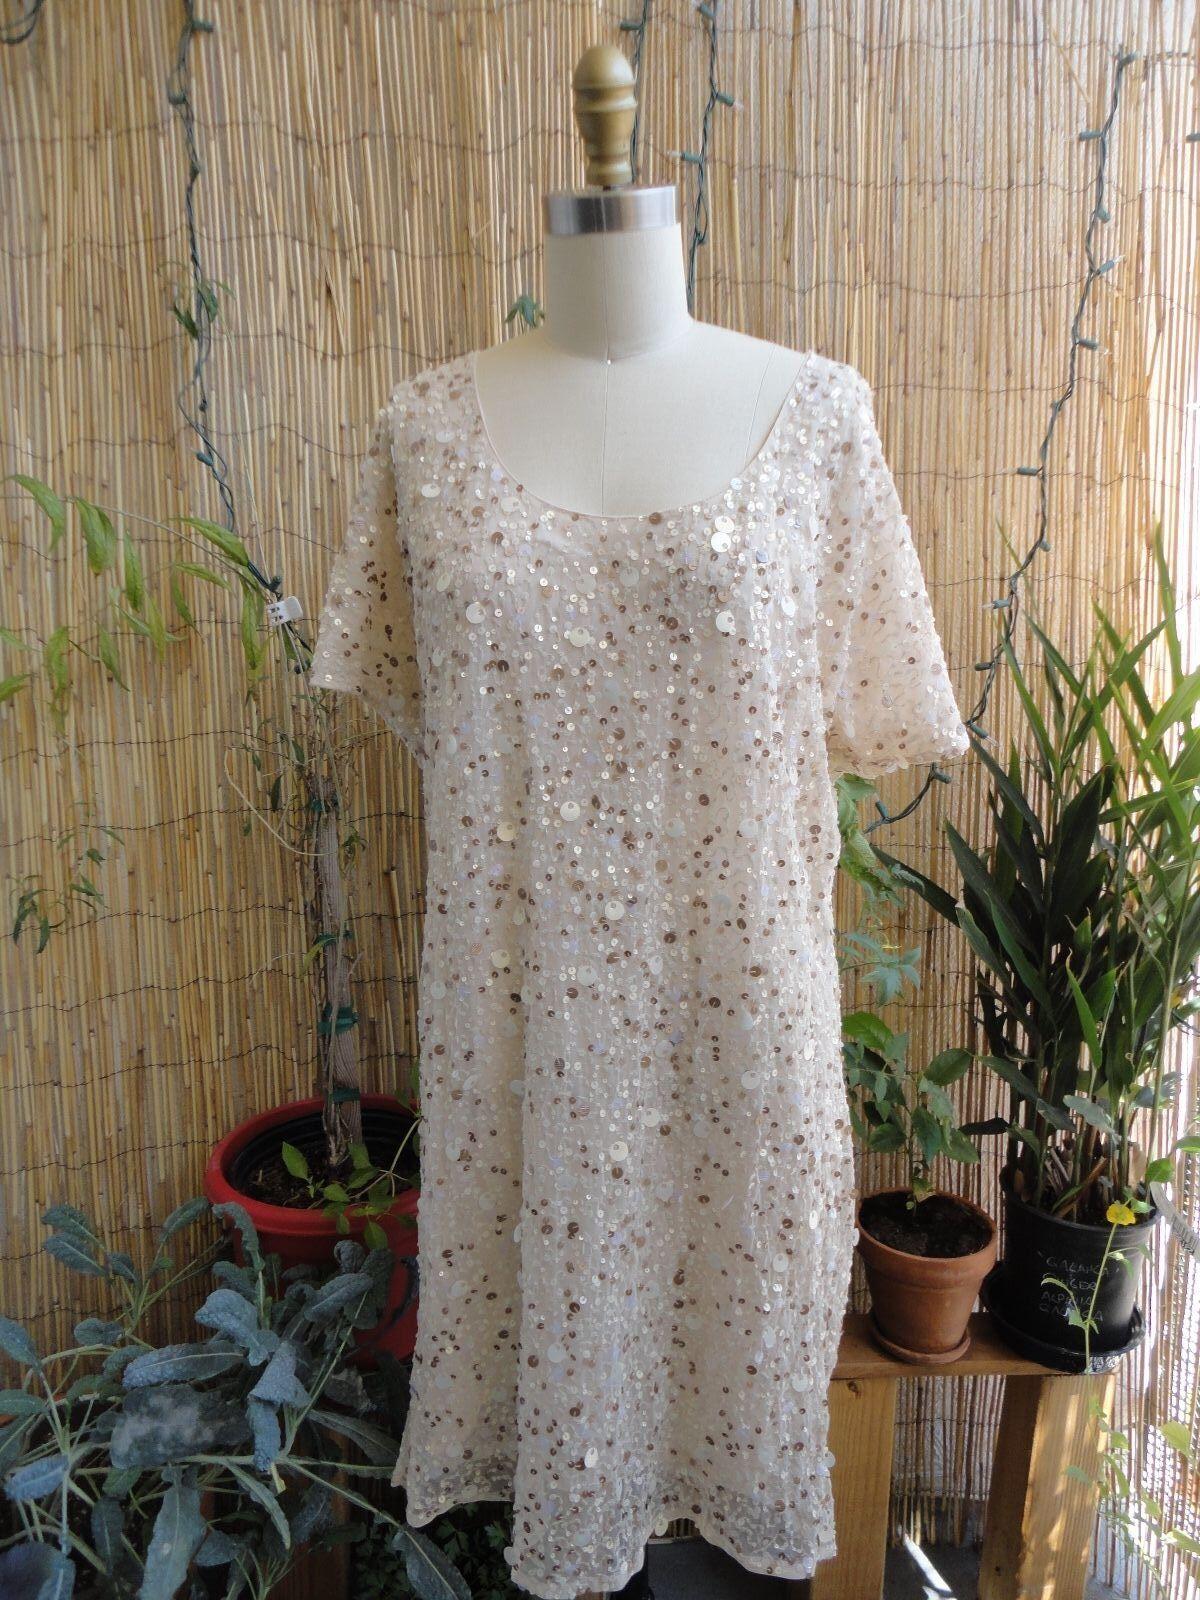 gold HAWK NWT Hand Sewn Sequin Paillettes Cold Shoulder Dress Camel Medium